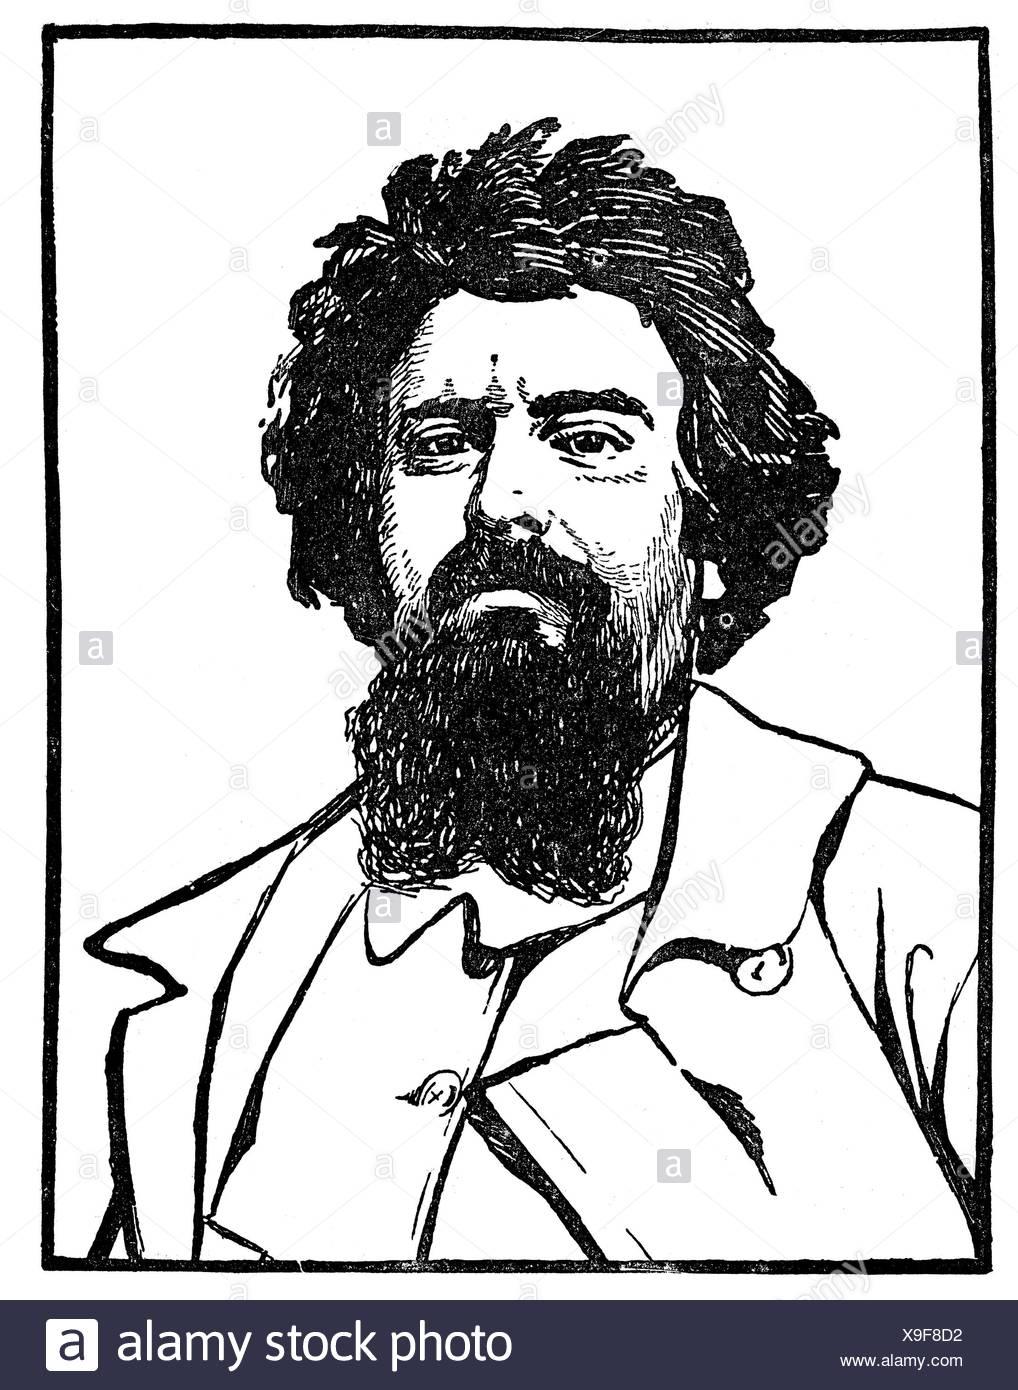 Künstler Maler Berlin segantini 15 1 1858 28 9 1899 schweizer künstler